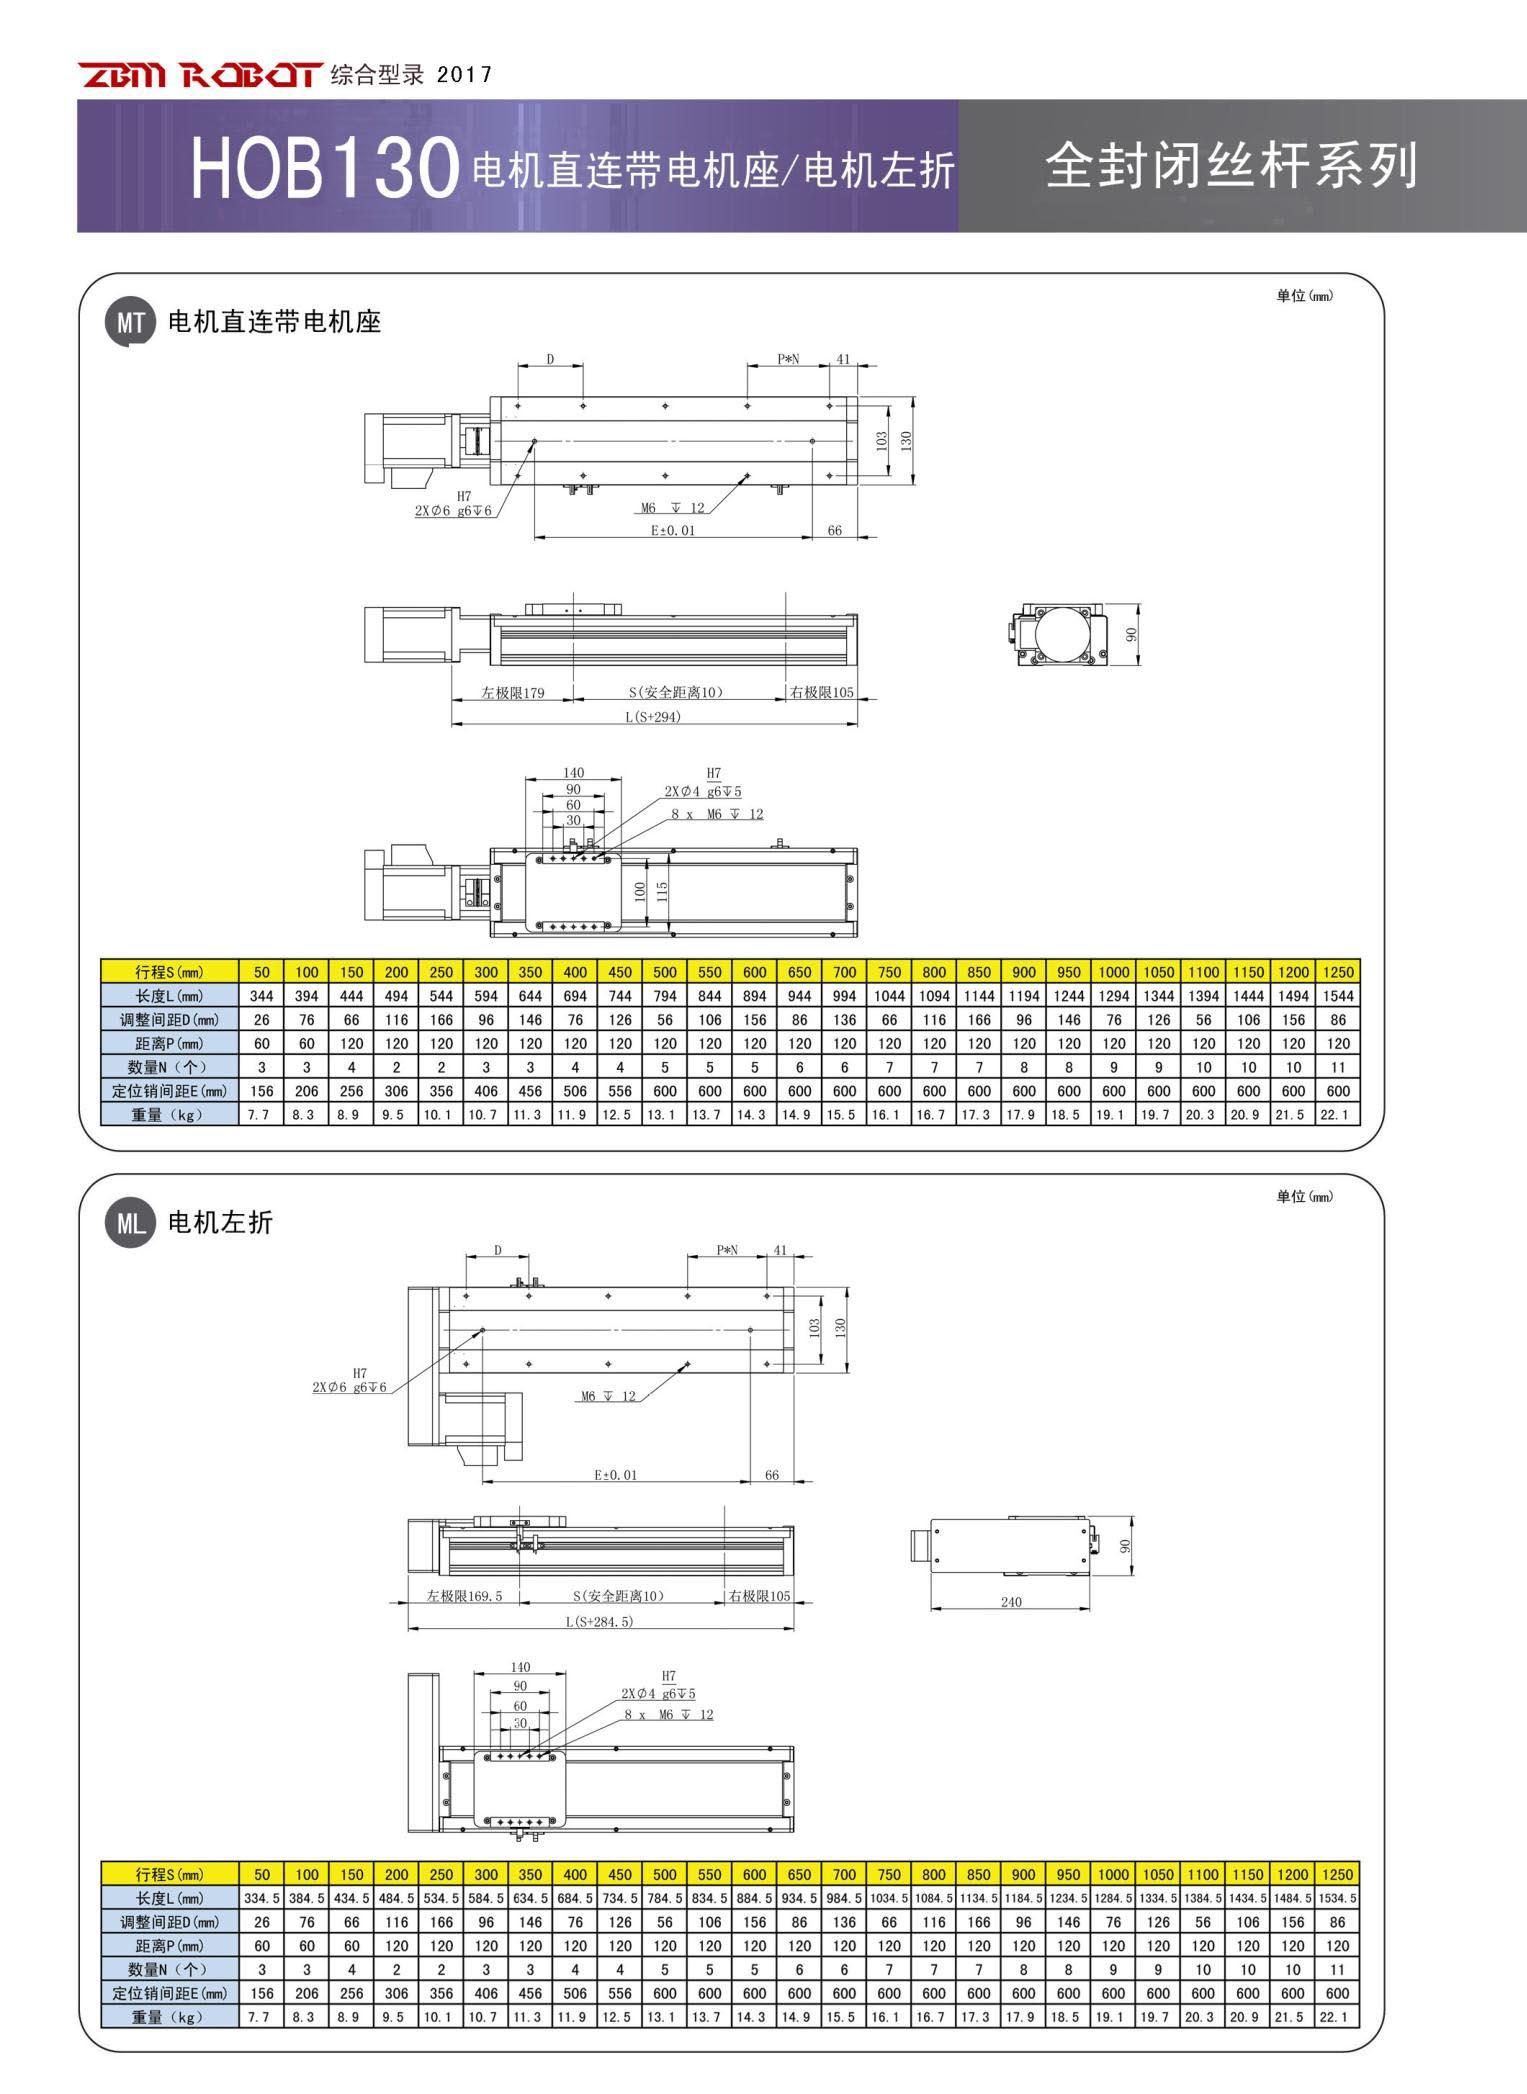 HOB130S-CR|全封闭丝杆模组-宝马娱乐在线1211app